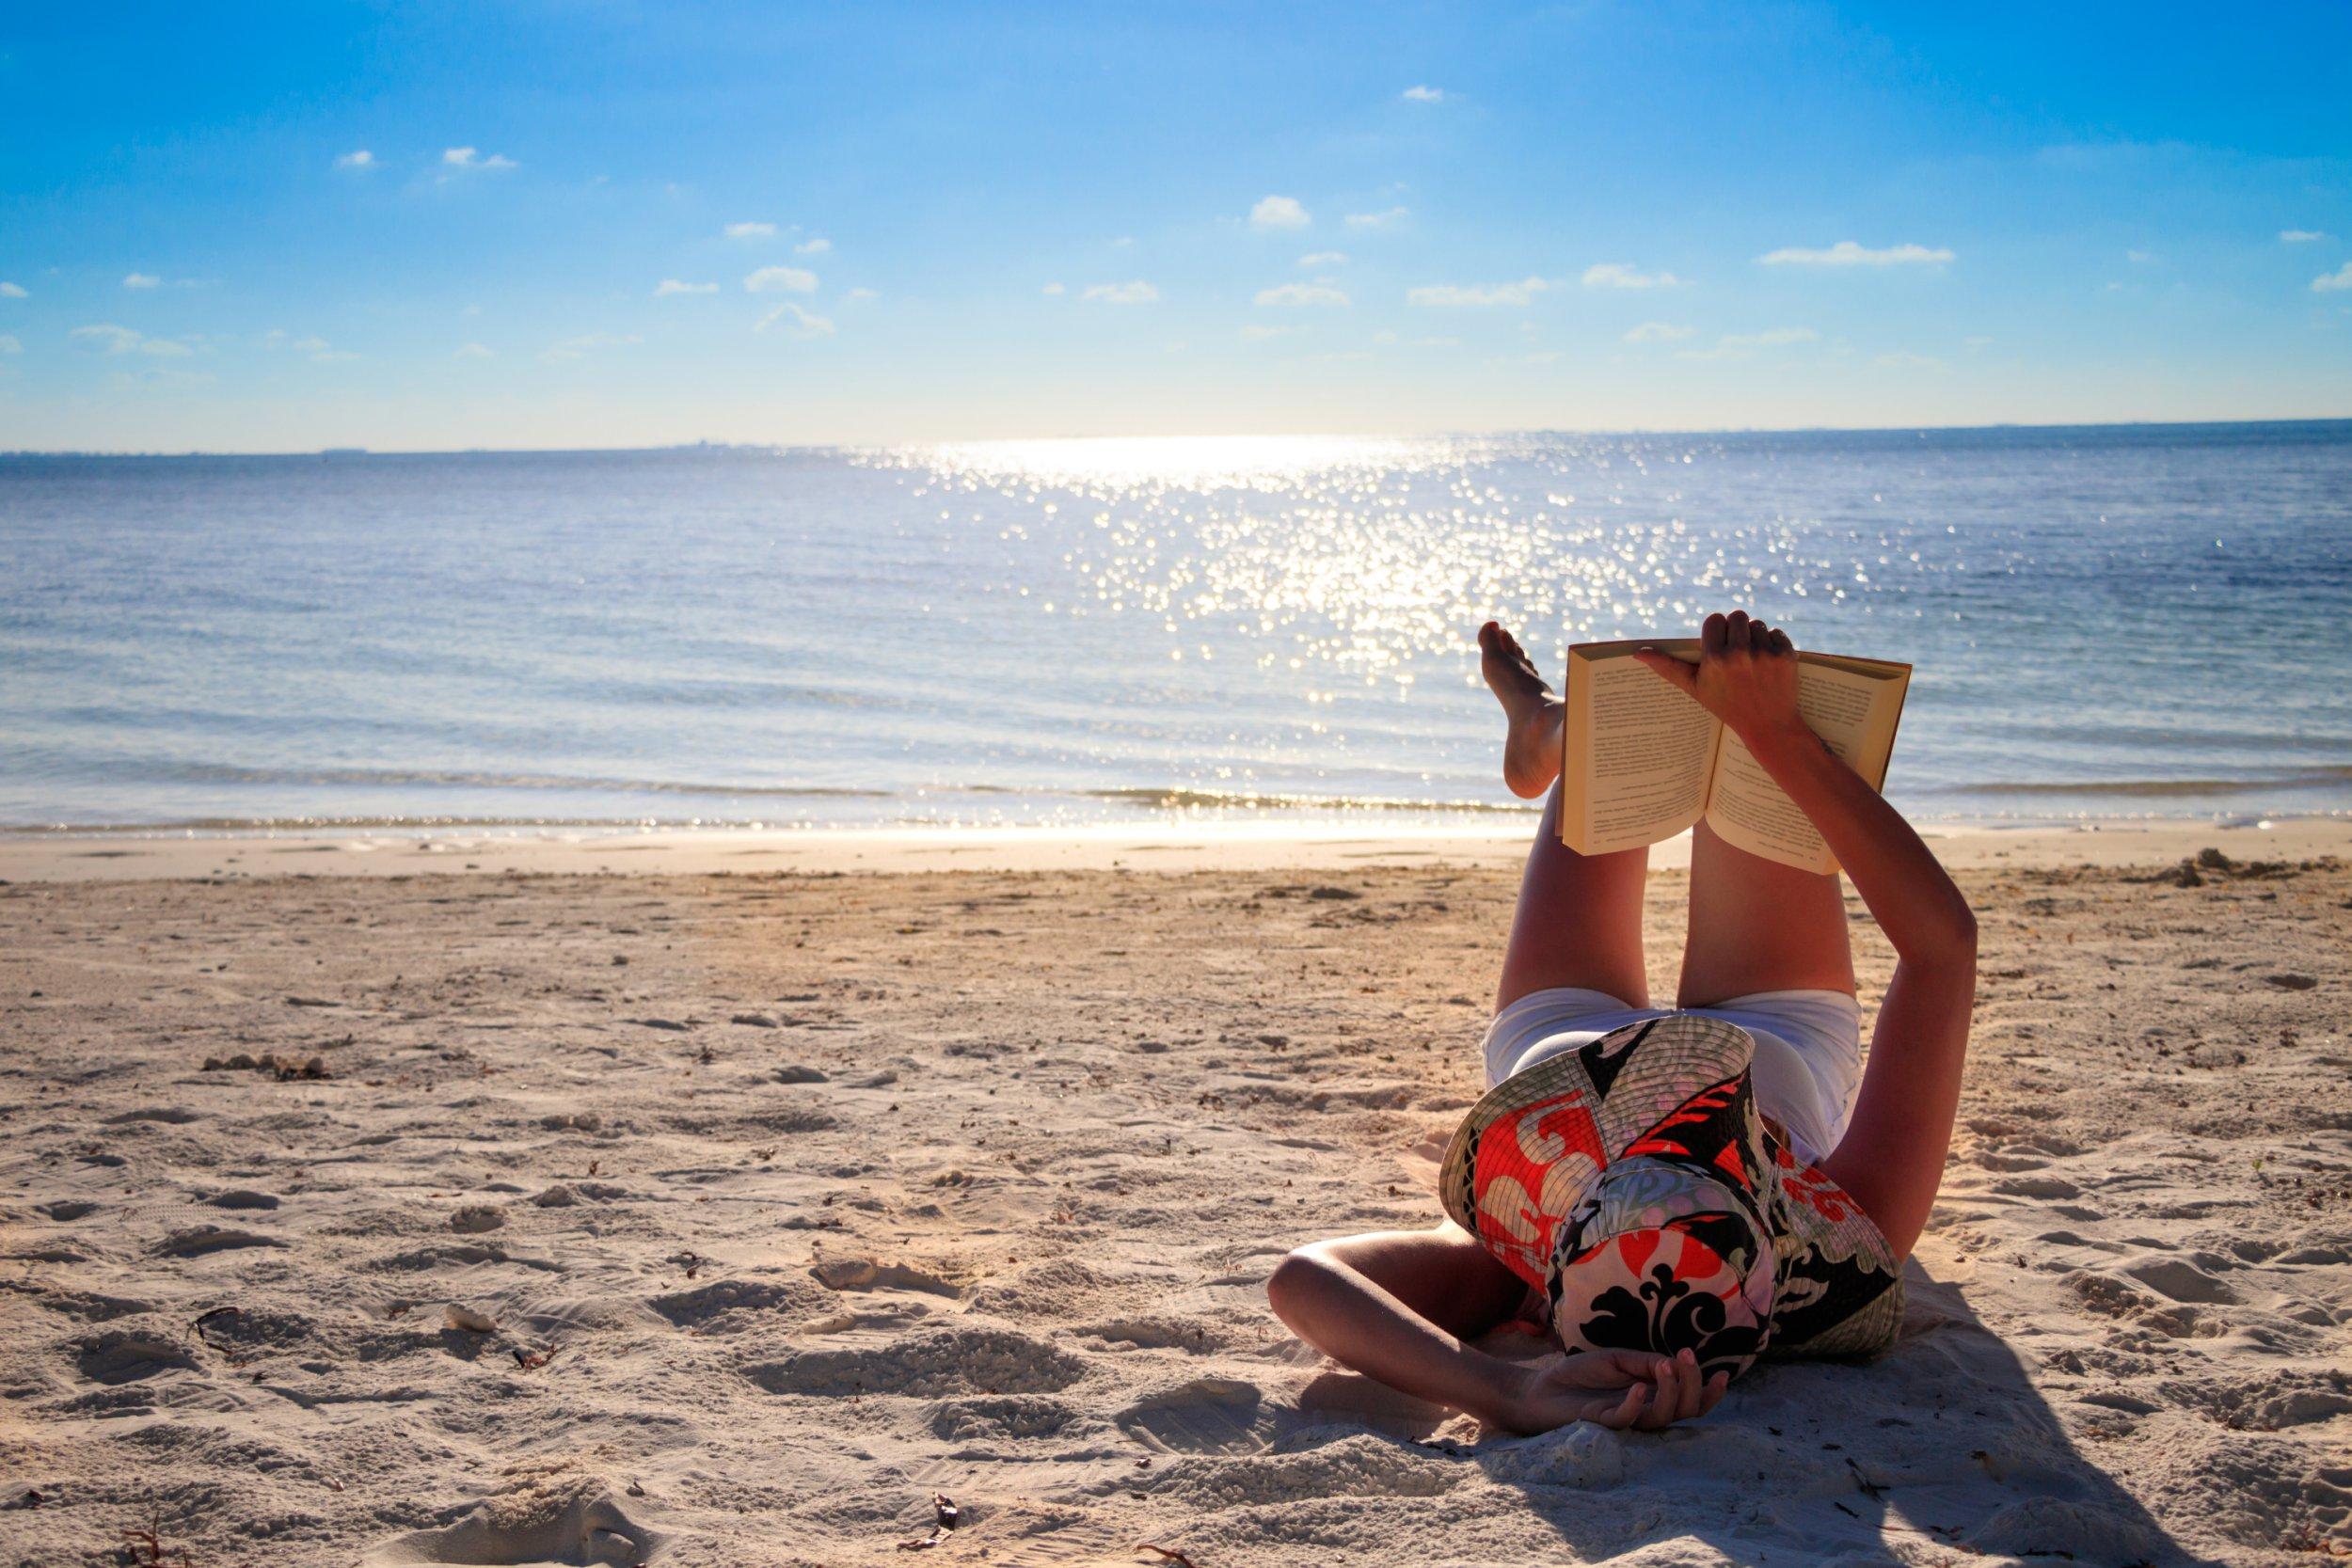 Dreamscape Escape with beauty lady on Maldives